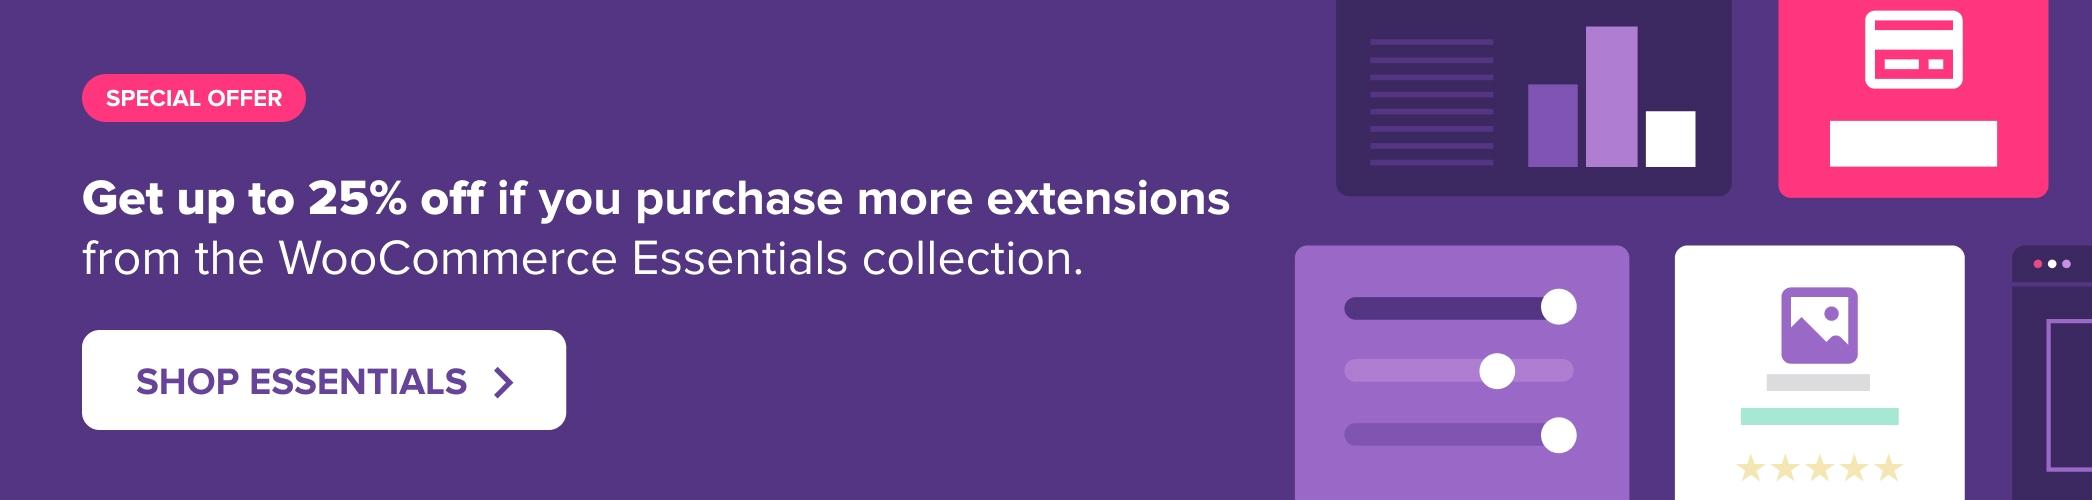 WooCommerce Essentials discount offer banner